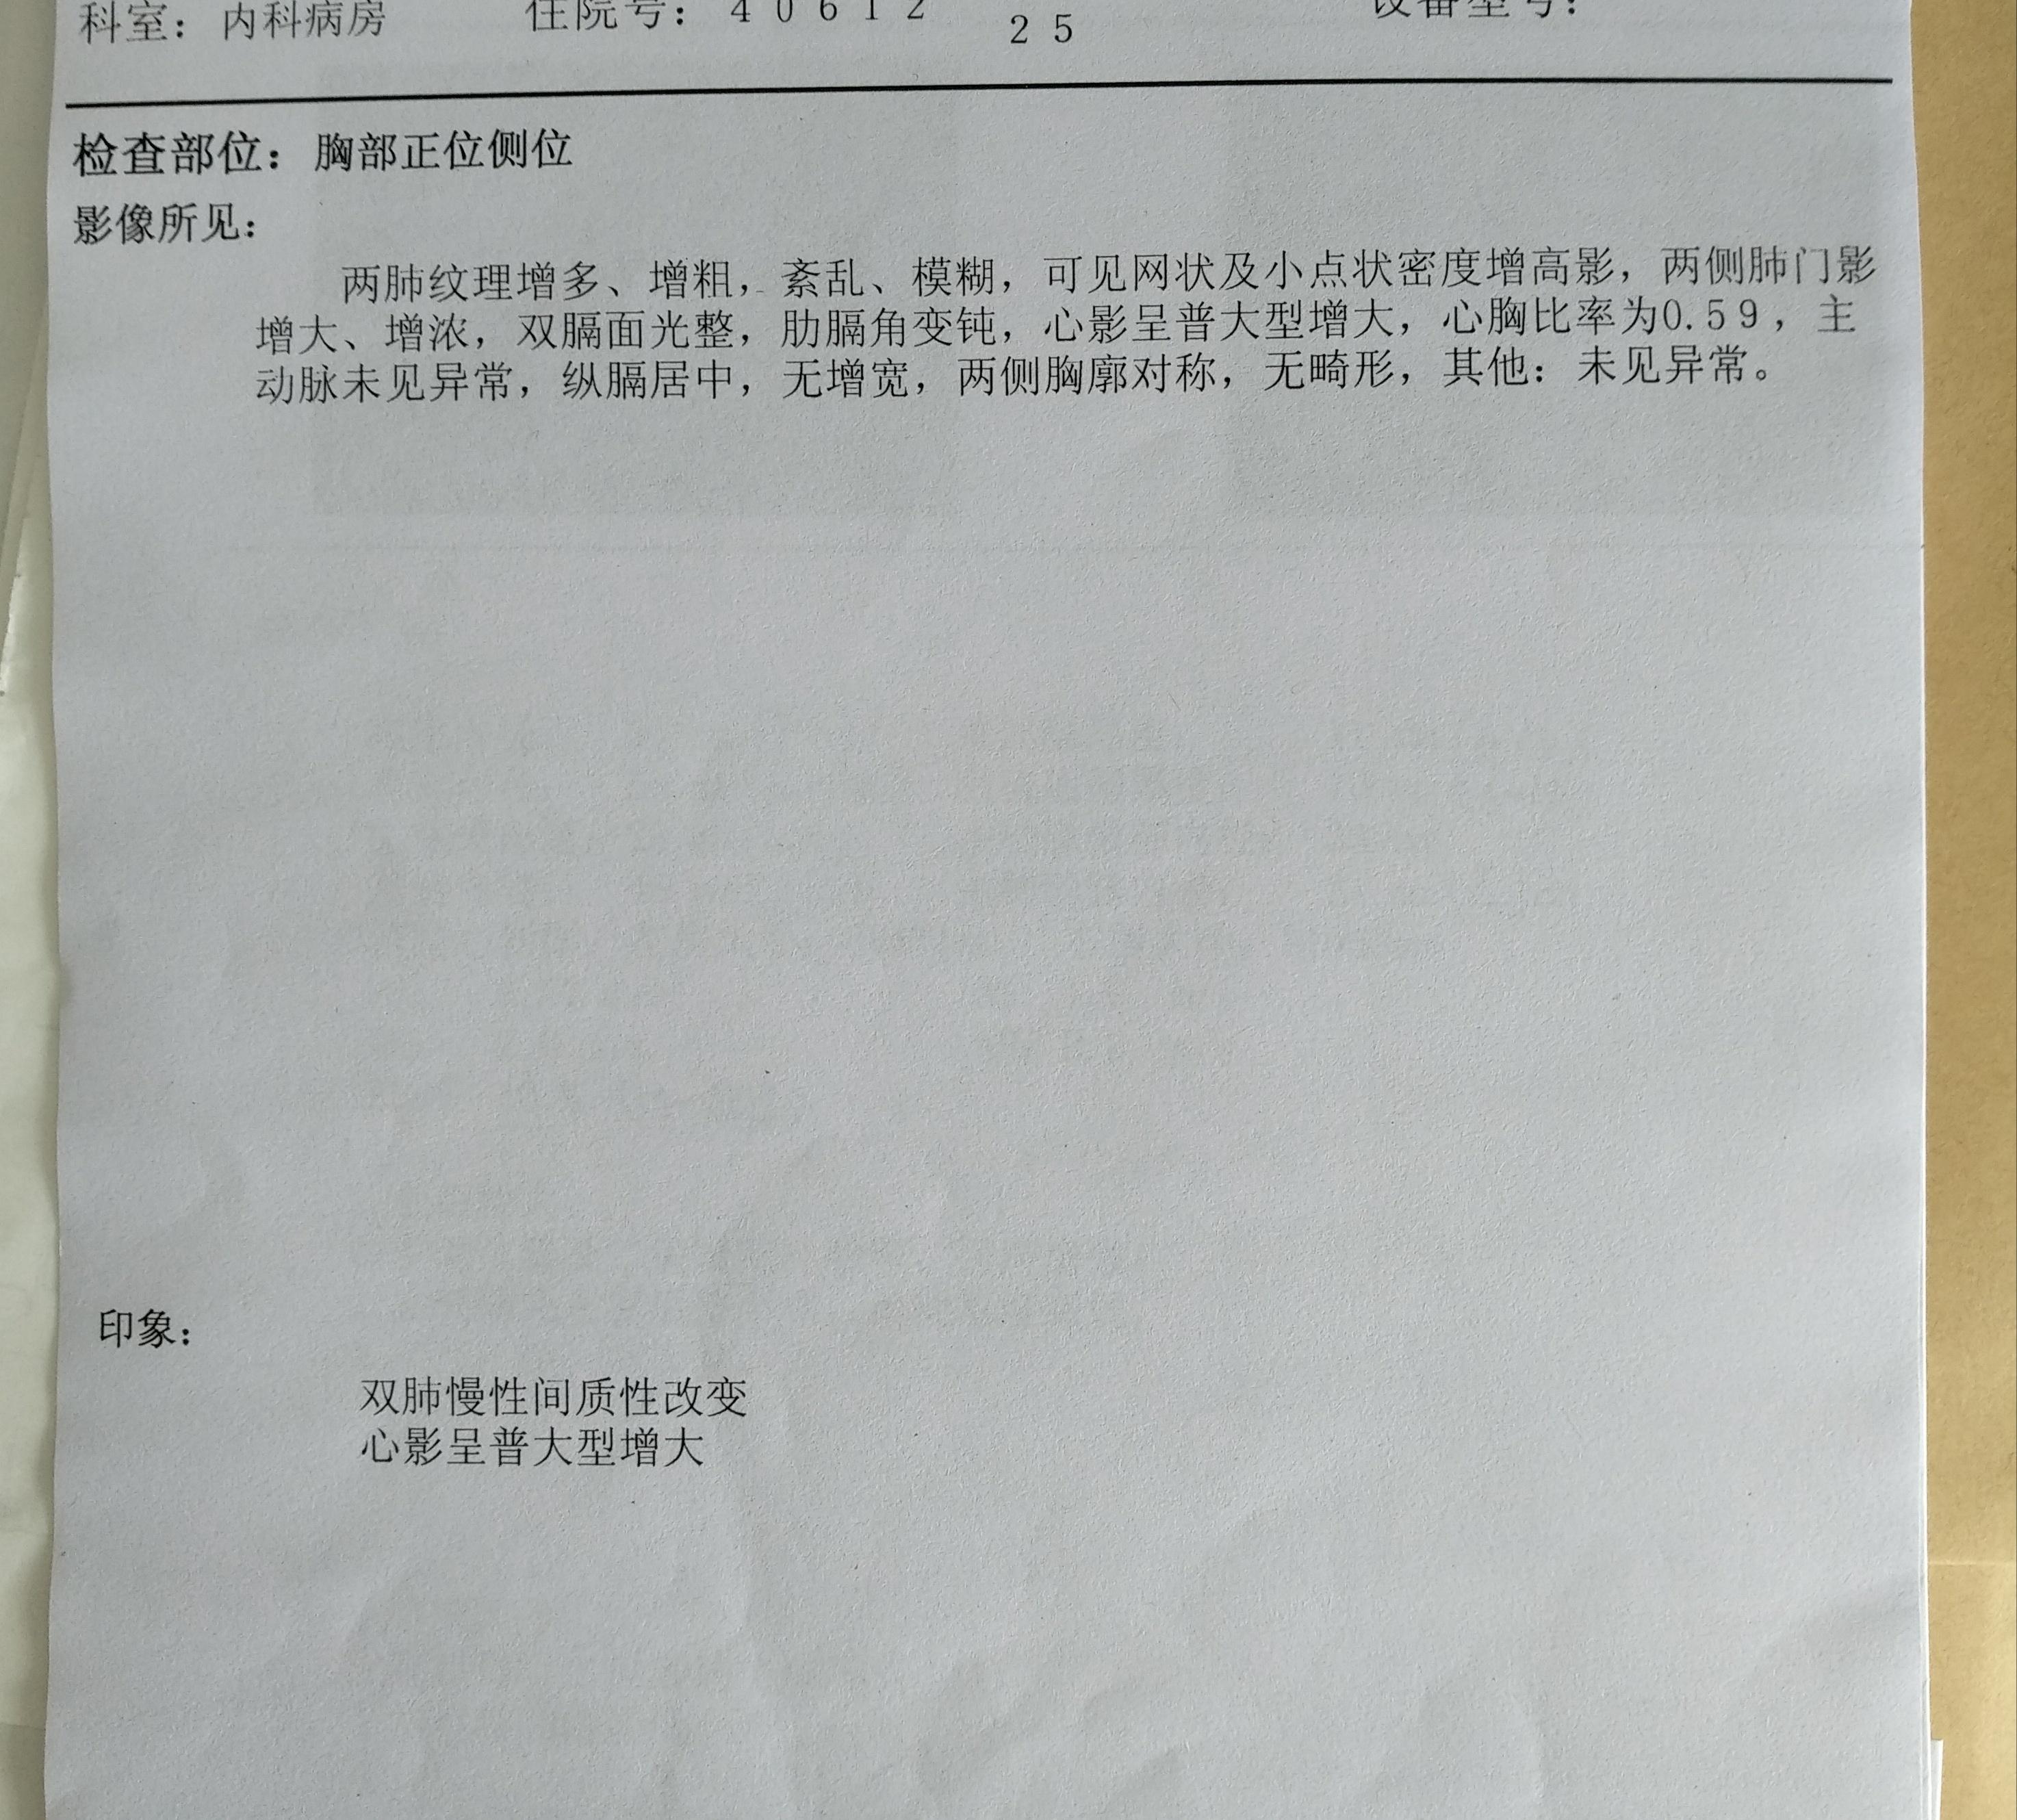 Du20180711